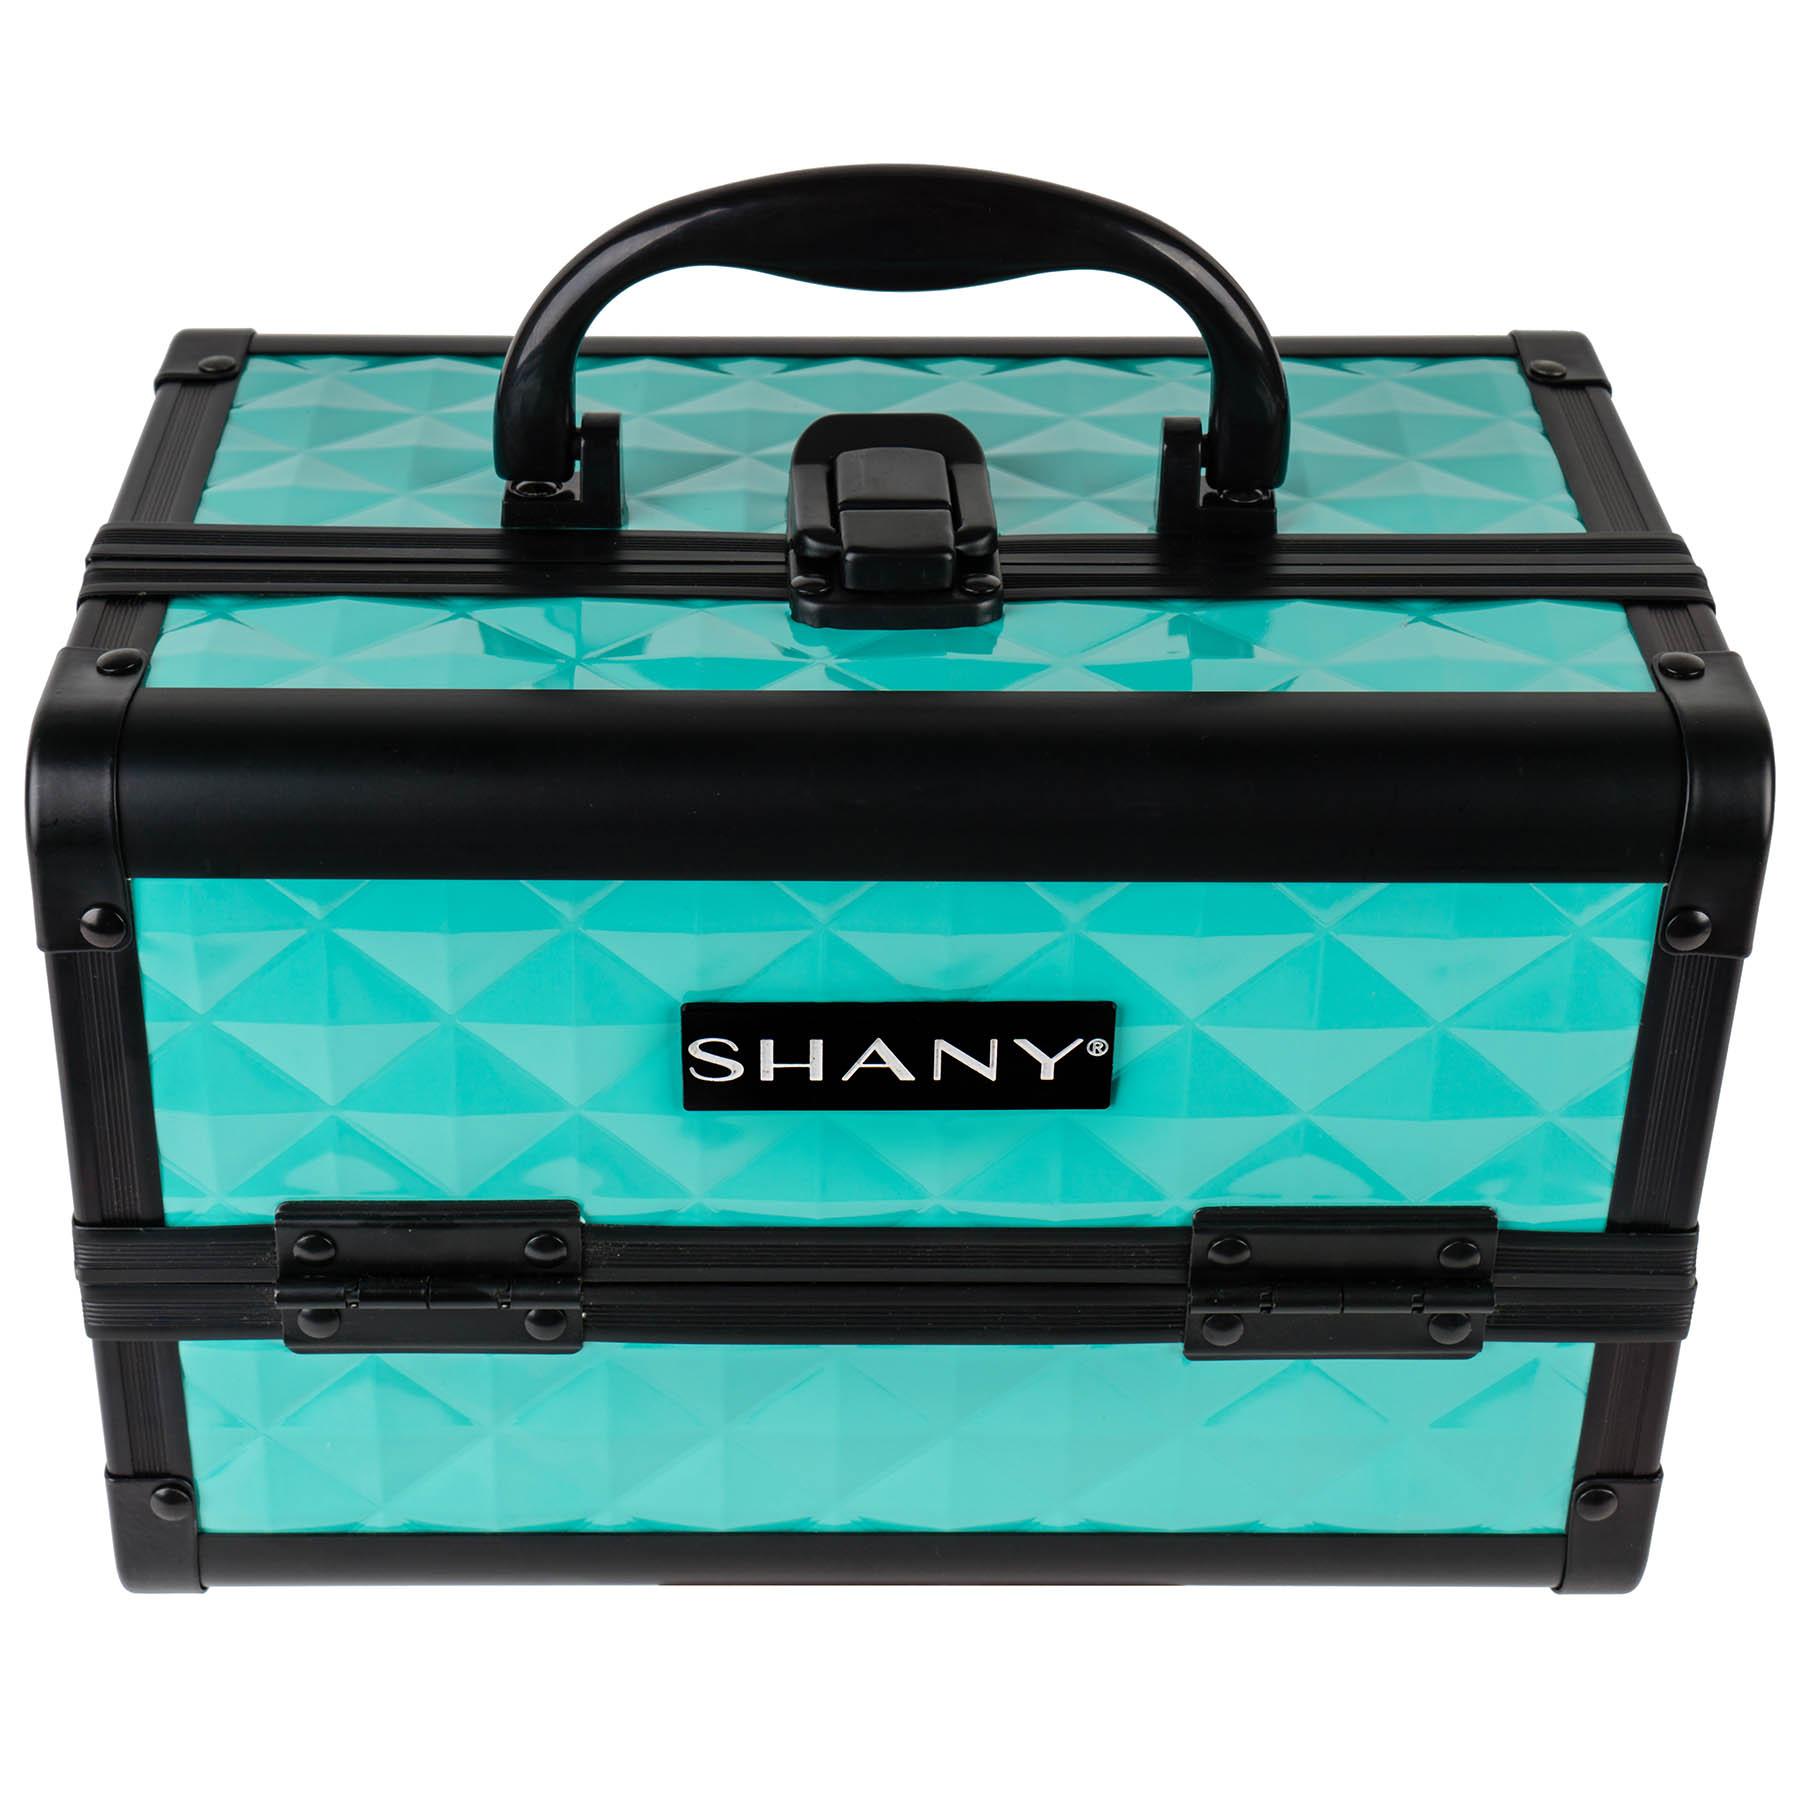 SHANY-Mini-Makeup-Train-Case-With-Mirror miniature 80